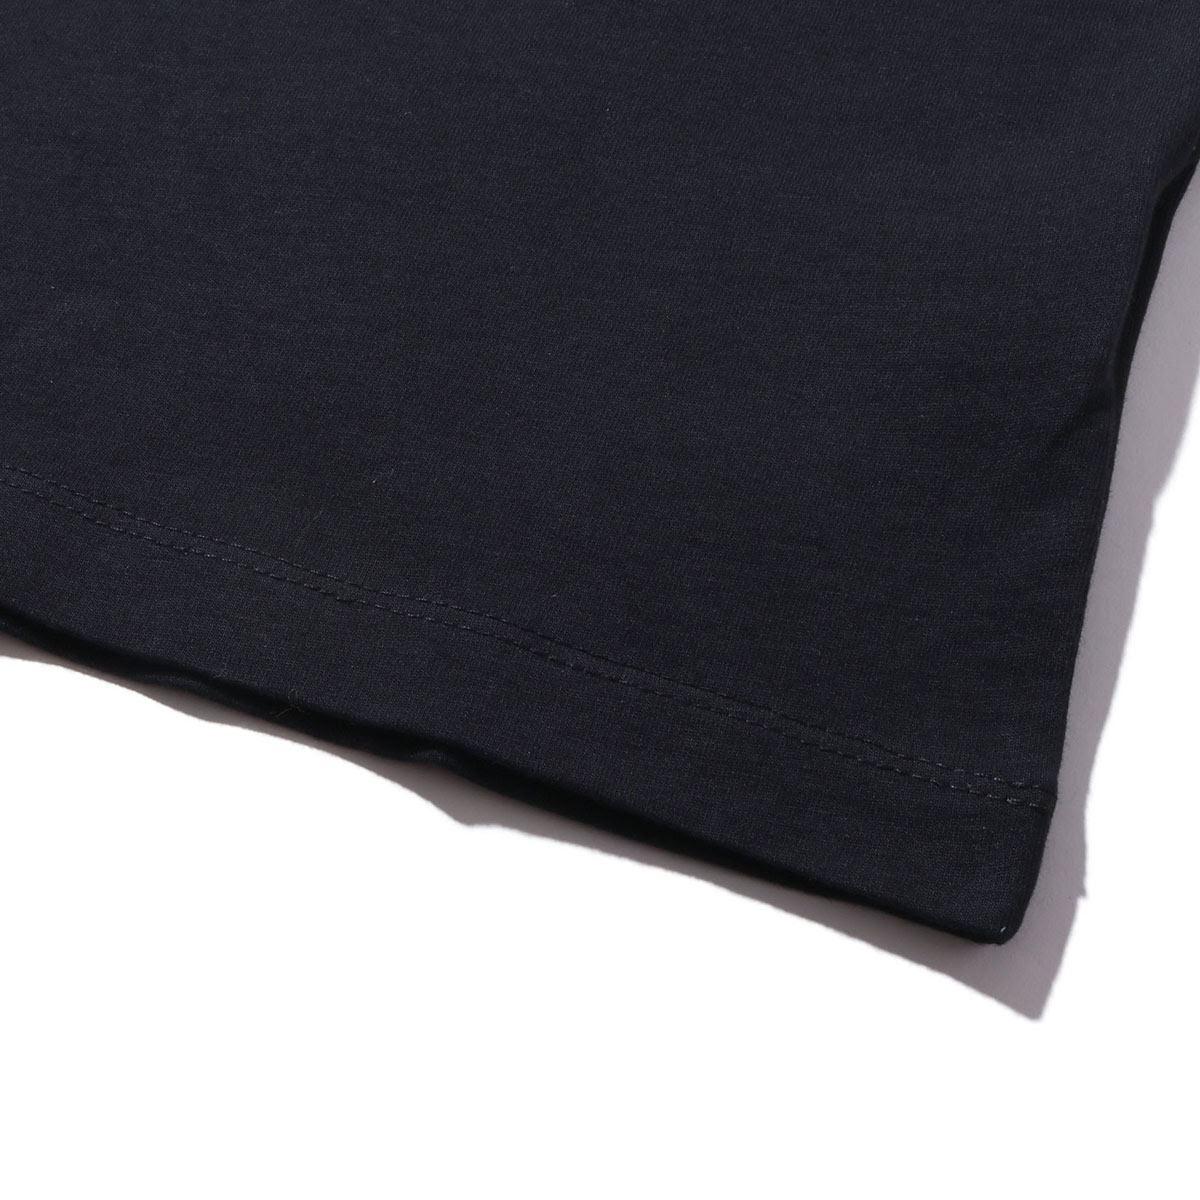 2762f553a61 NIKEBNSWTEEFUTURAICONTD(ナイキYTHフューチュラアイコンTDTシャツ)BLACK WHITE キッズTシャツ